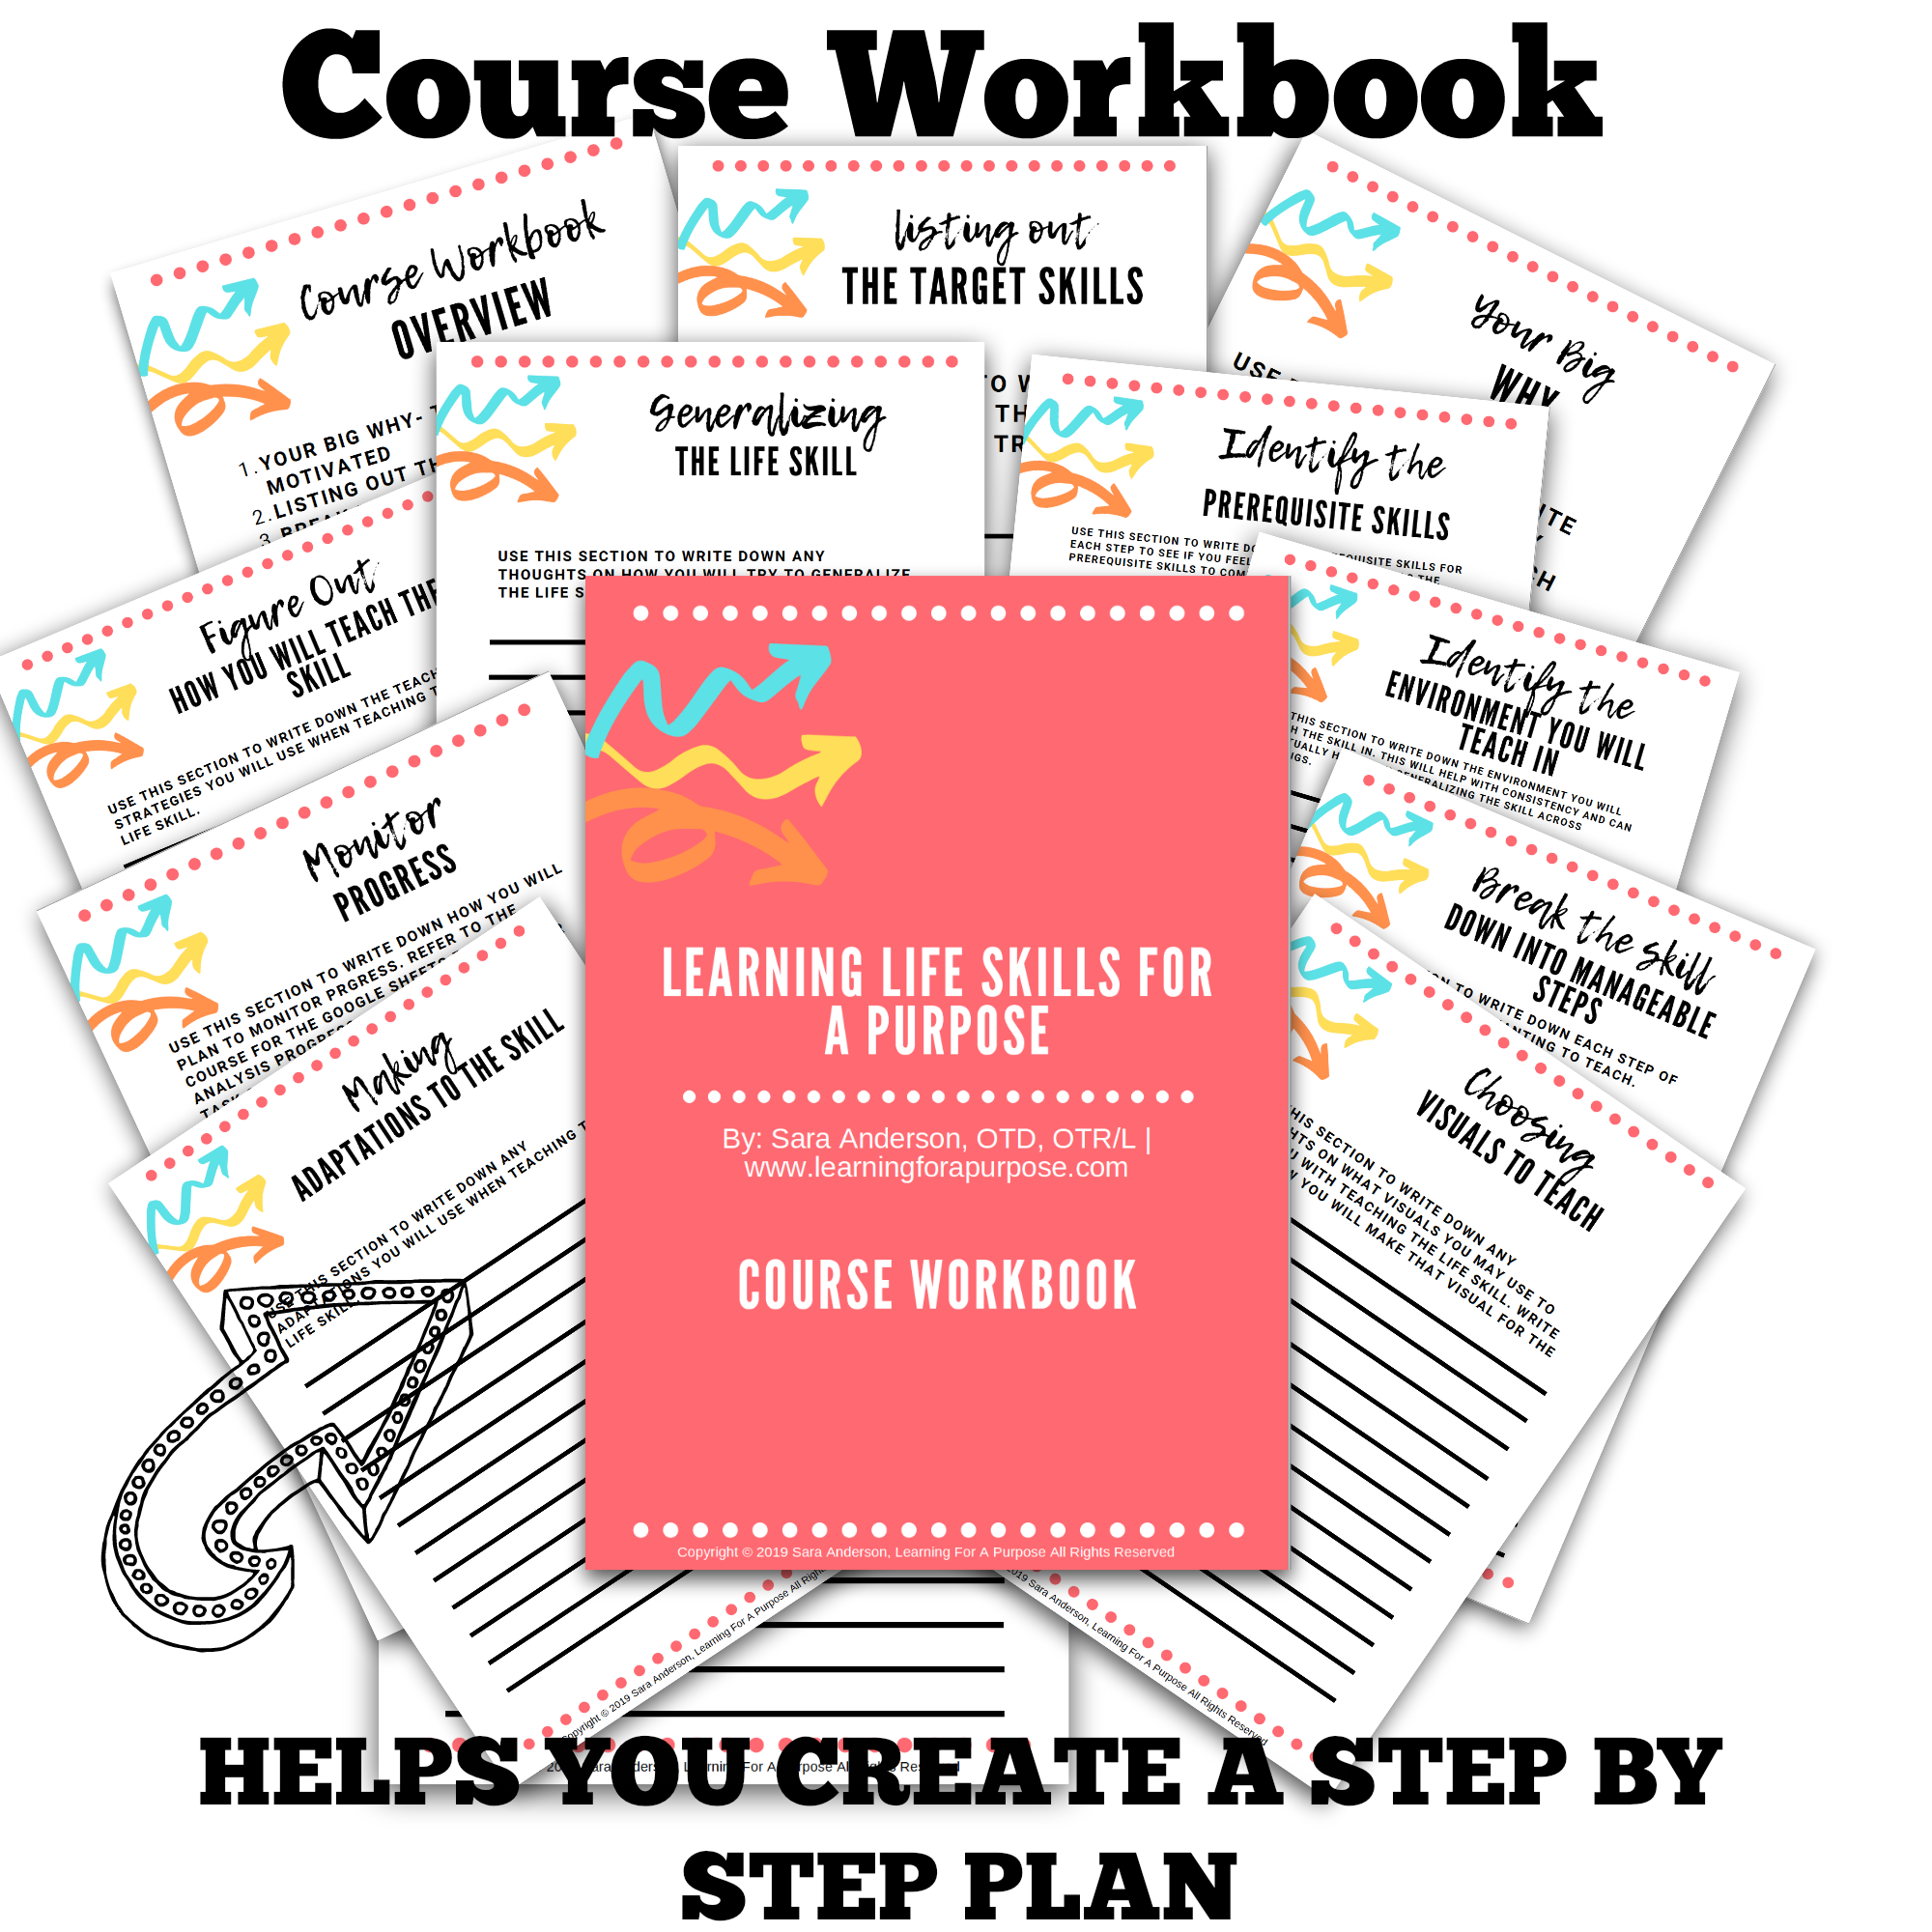 Life skills course workbook display image